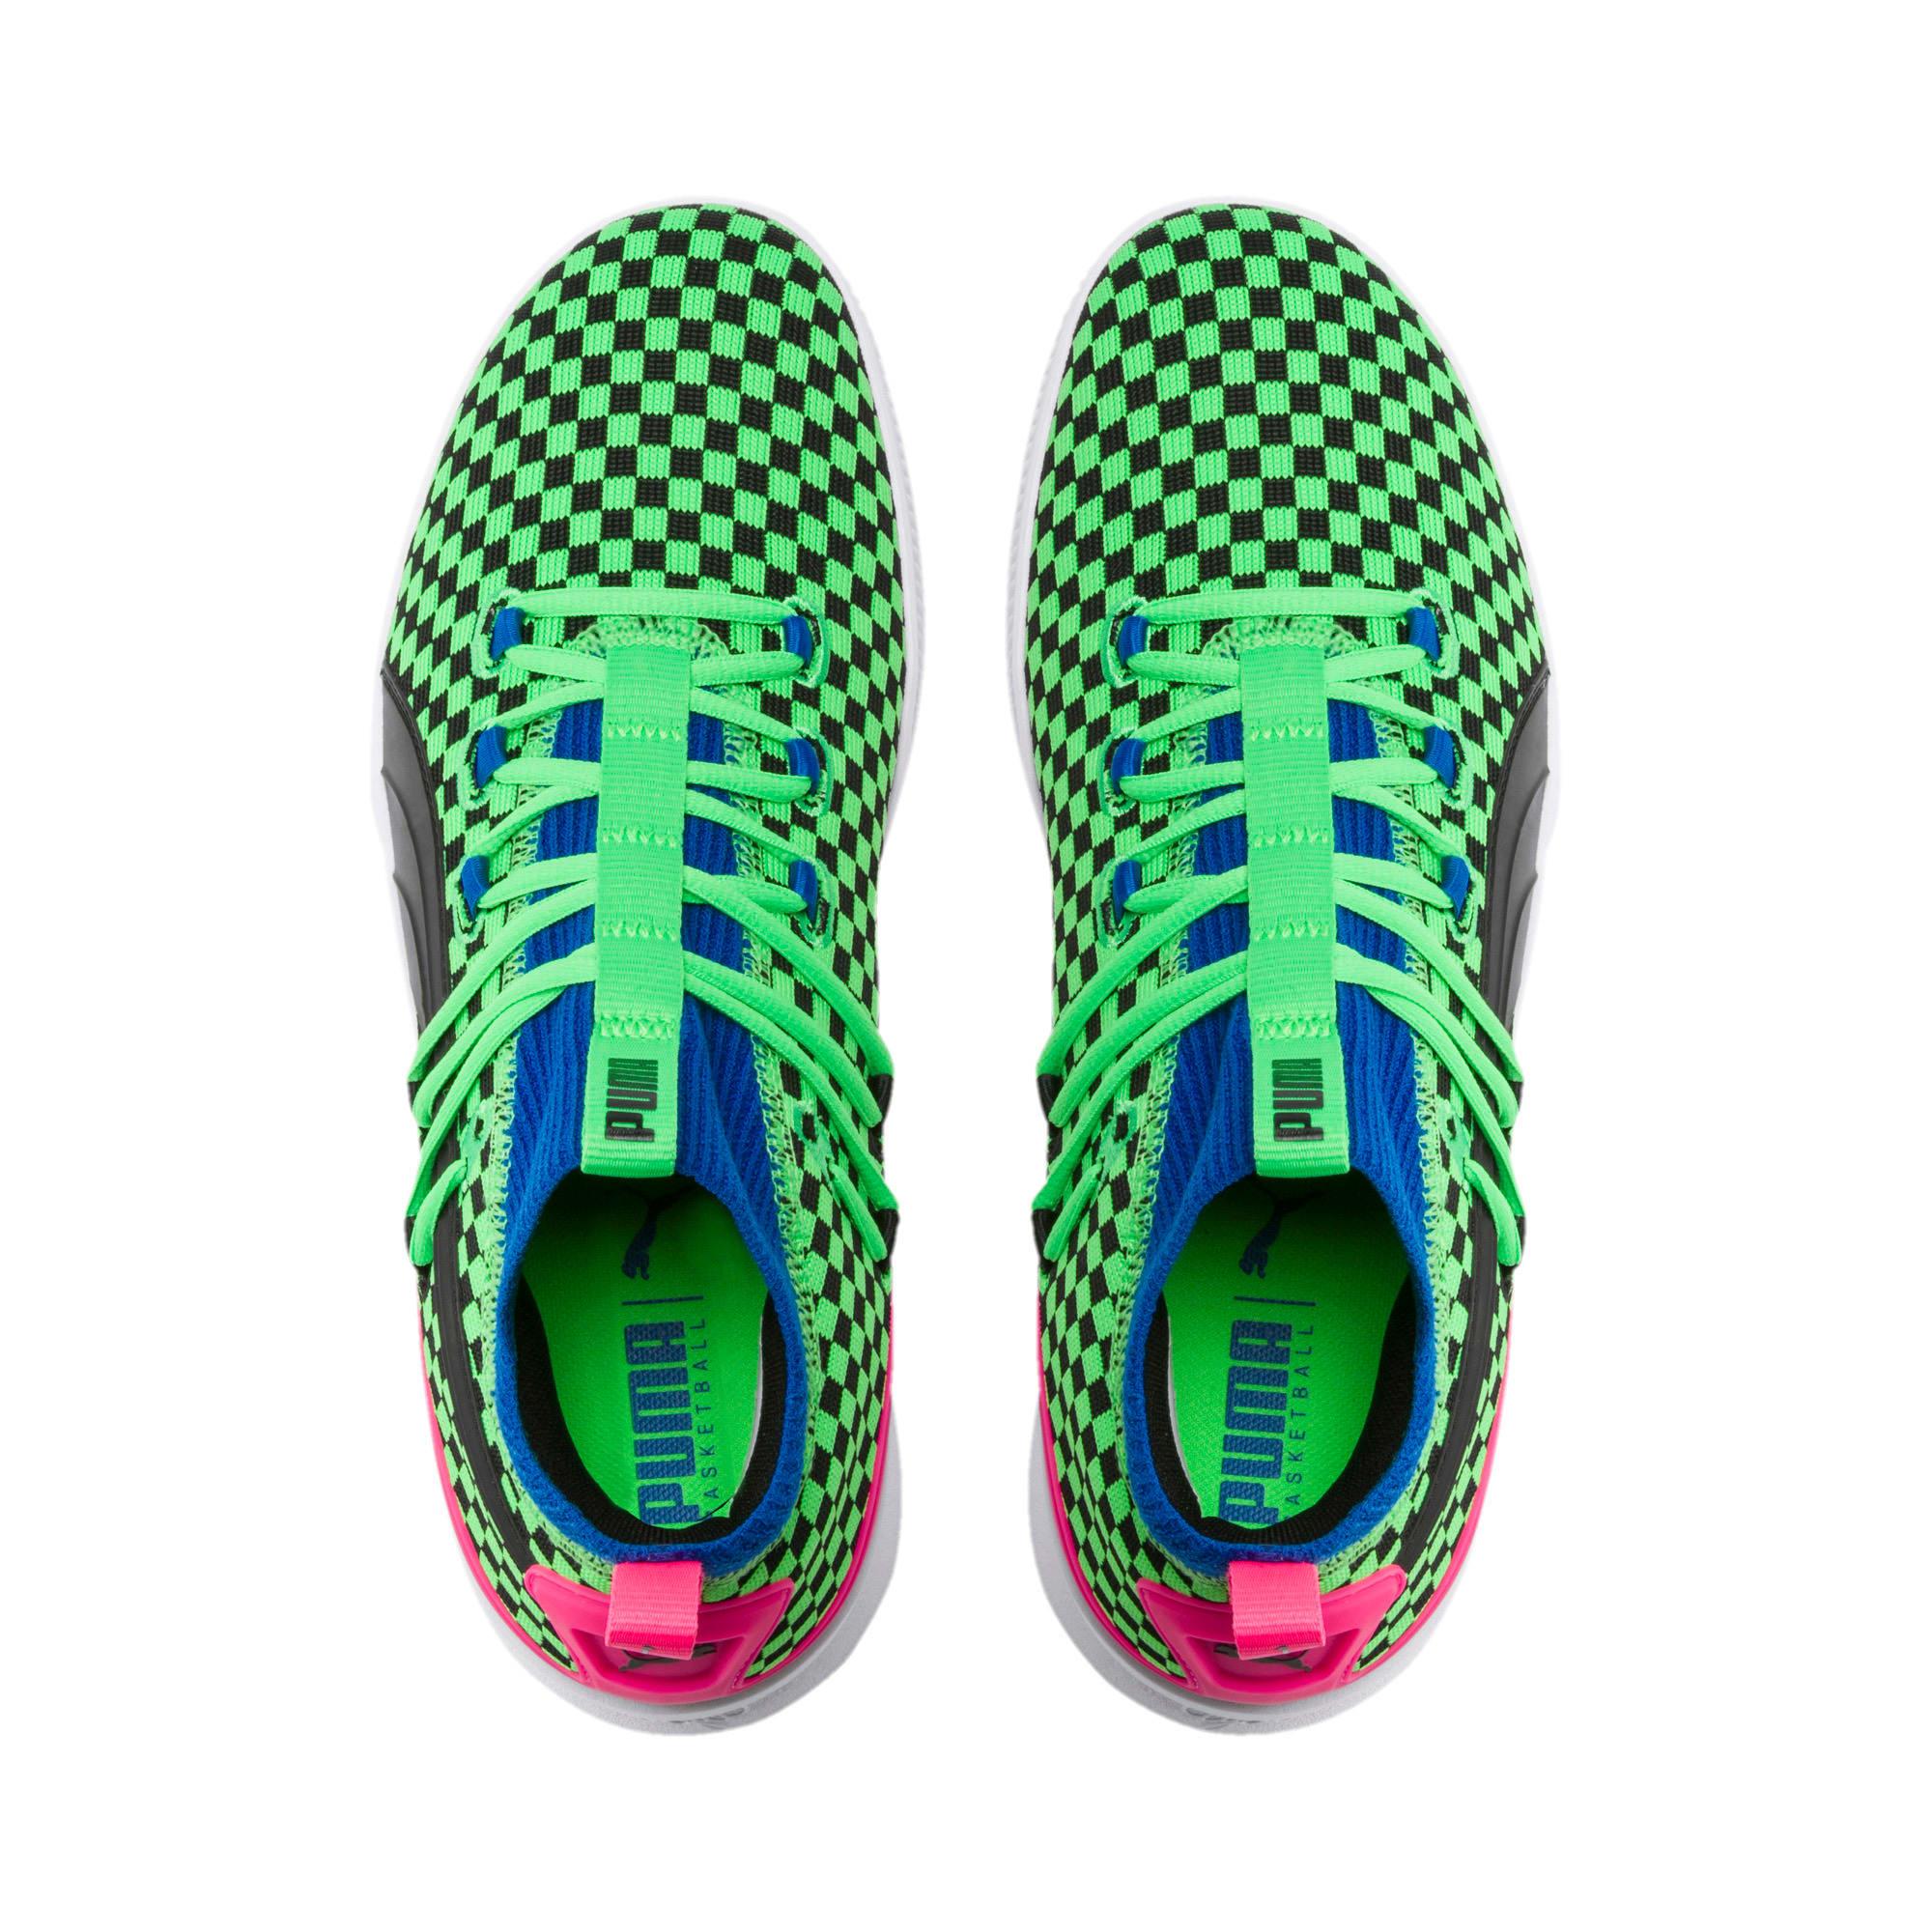 Thumbnail 6 of Clyde Court Summertime Basketball Shoes, 802 C Fluro Green PES, medium